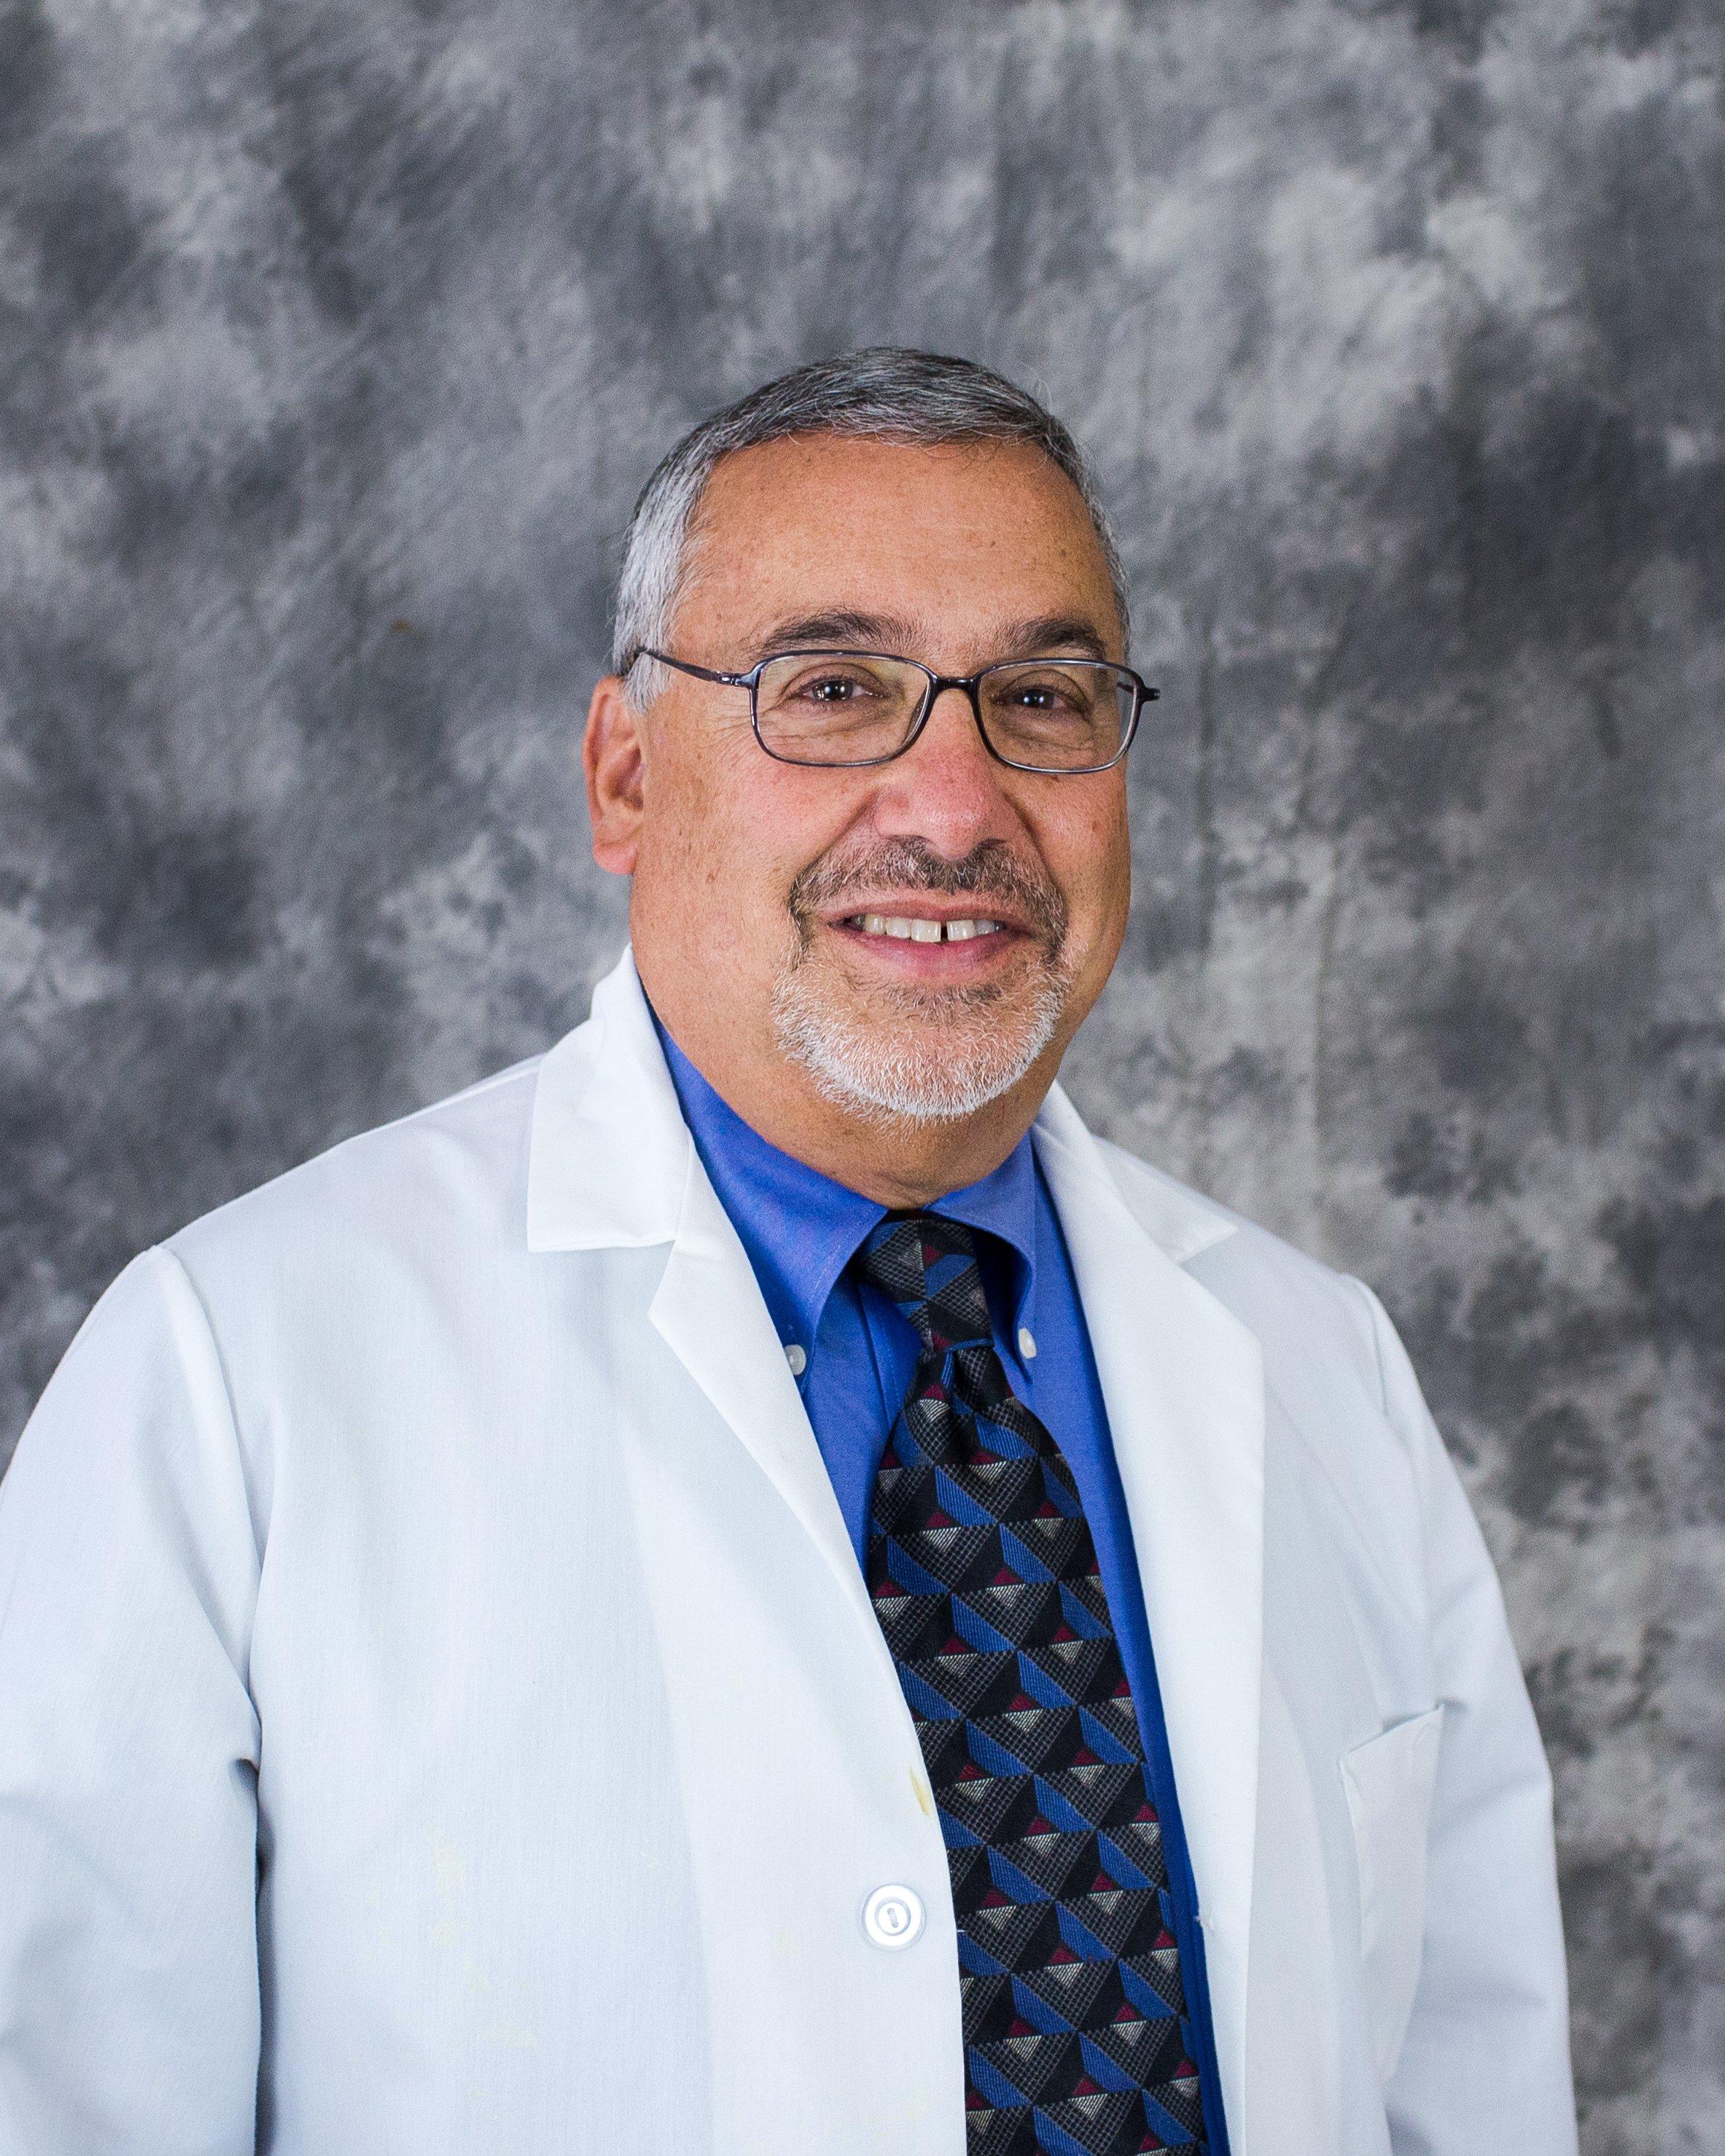 Dr. Bruce Goldman